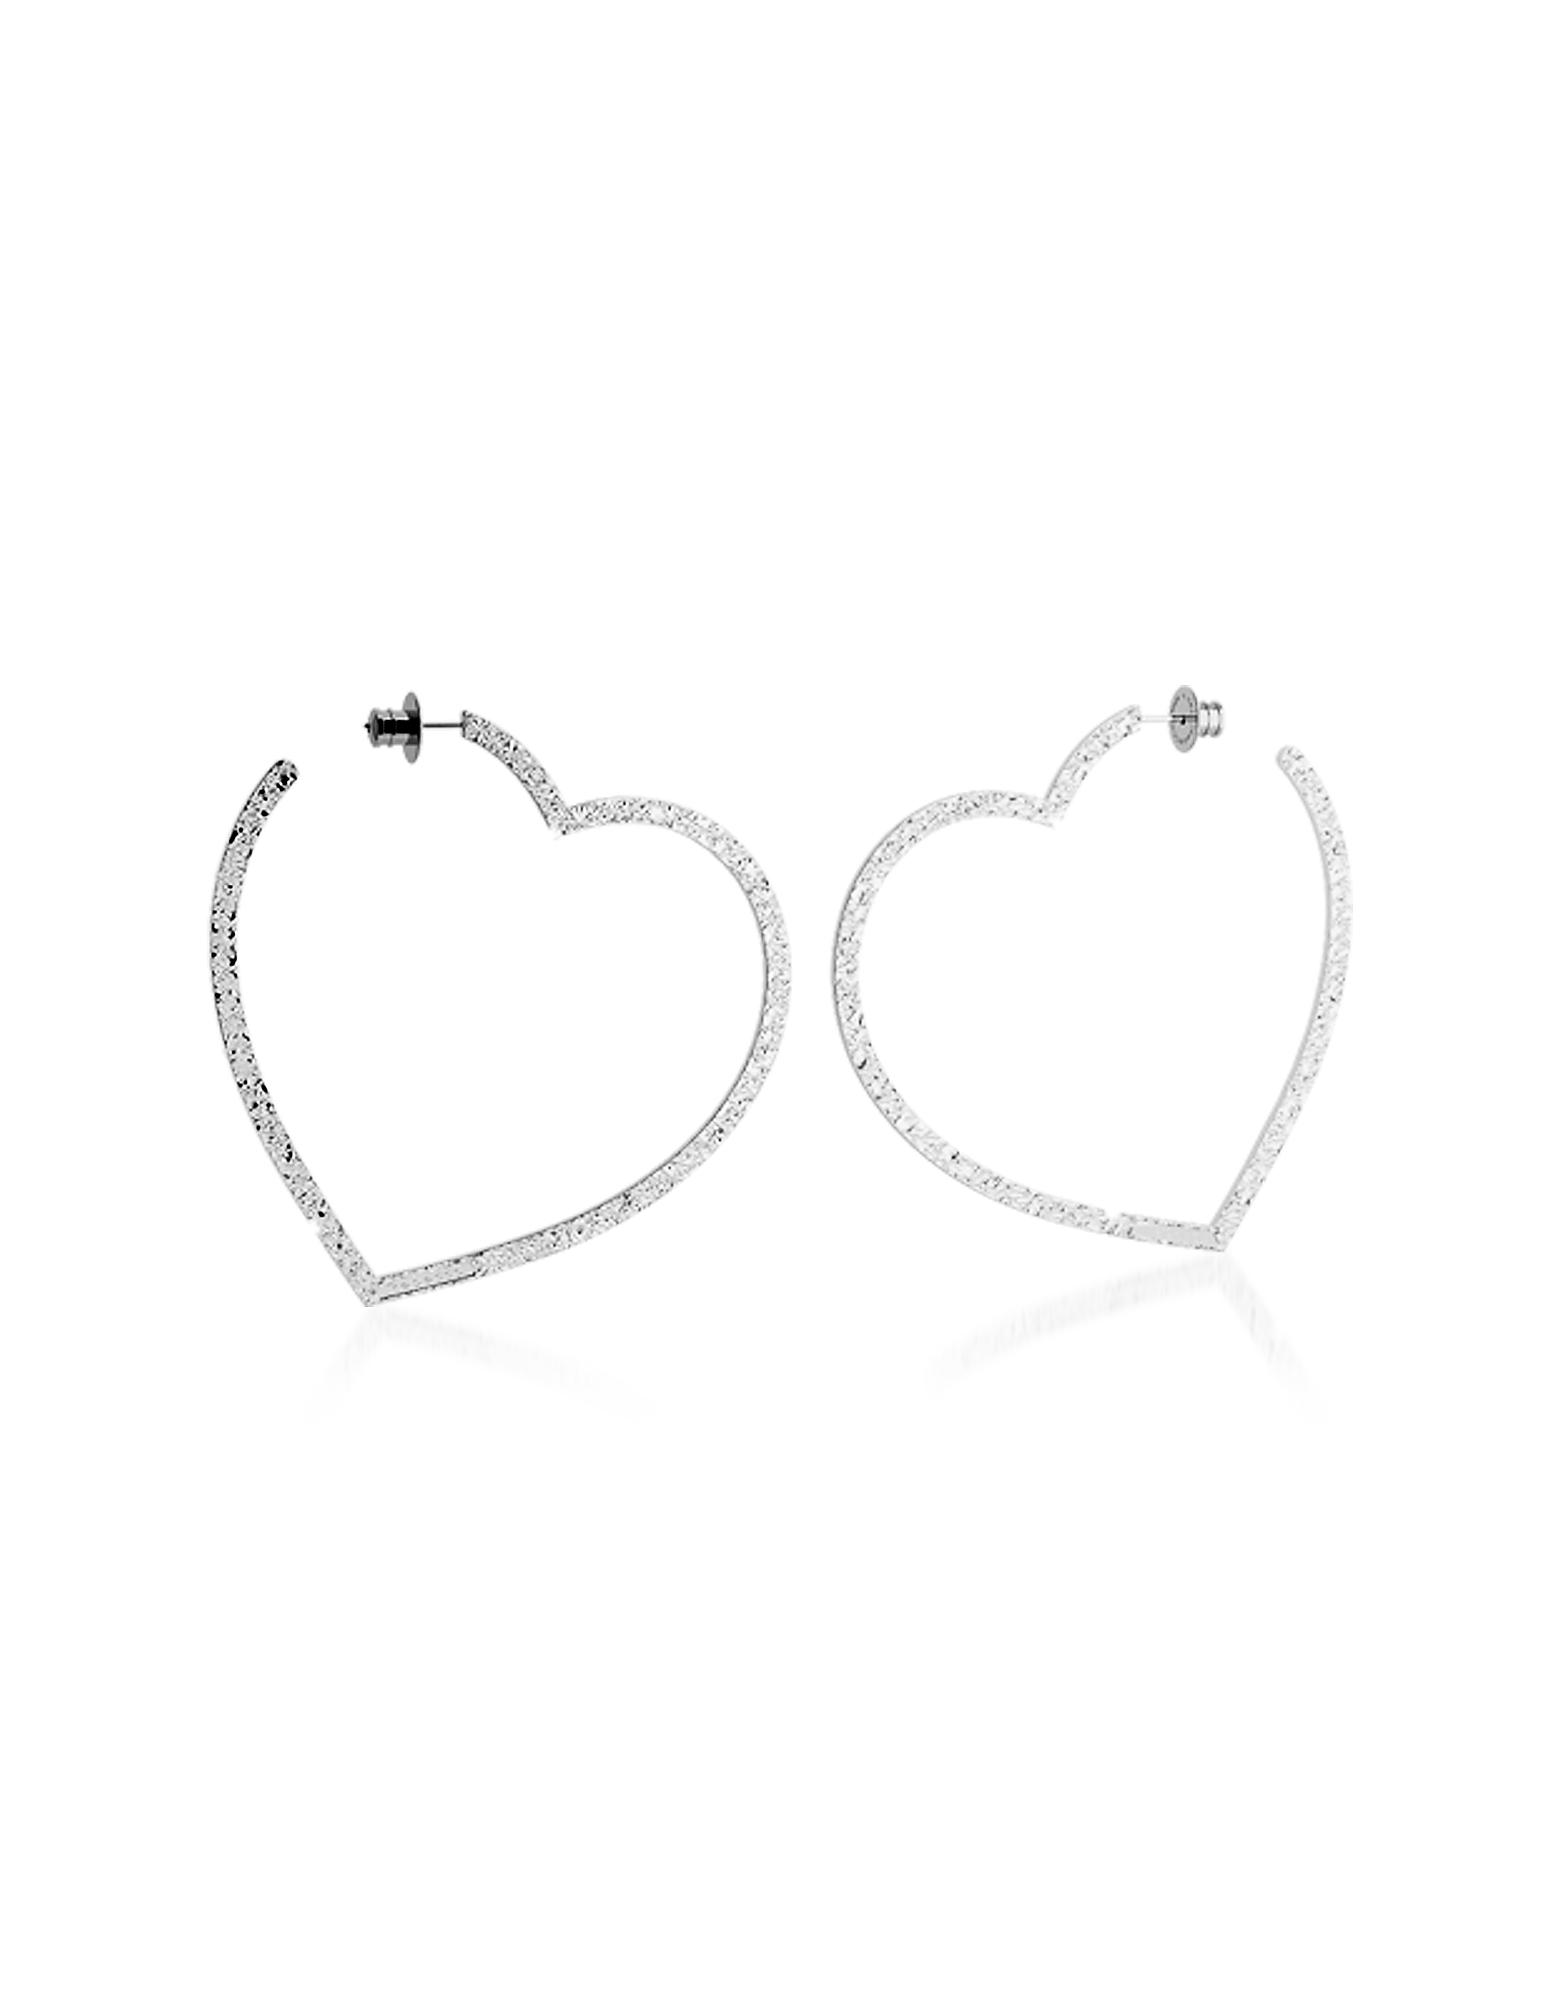 R-ZERO Rhodium Over Bronze Heart Earrings